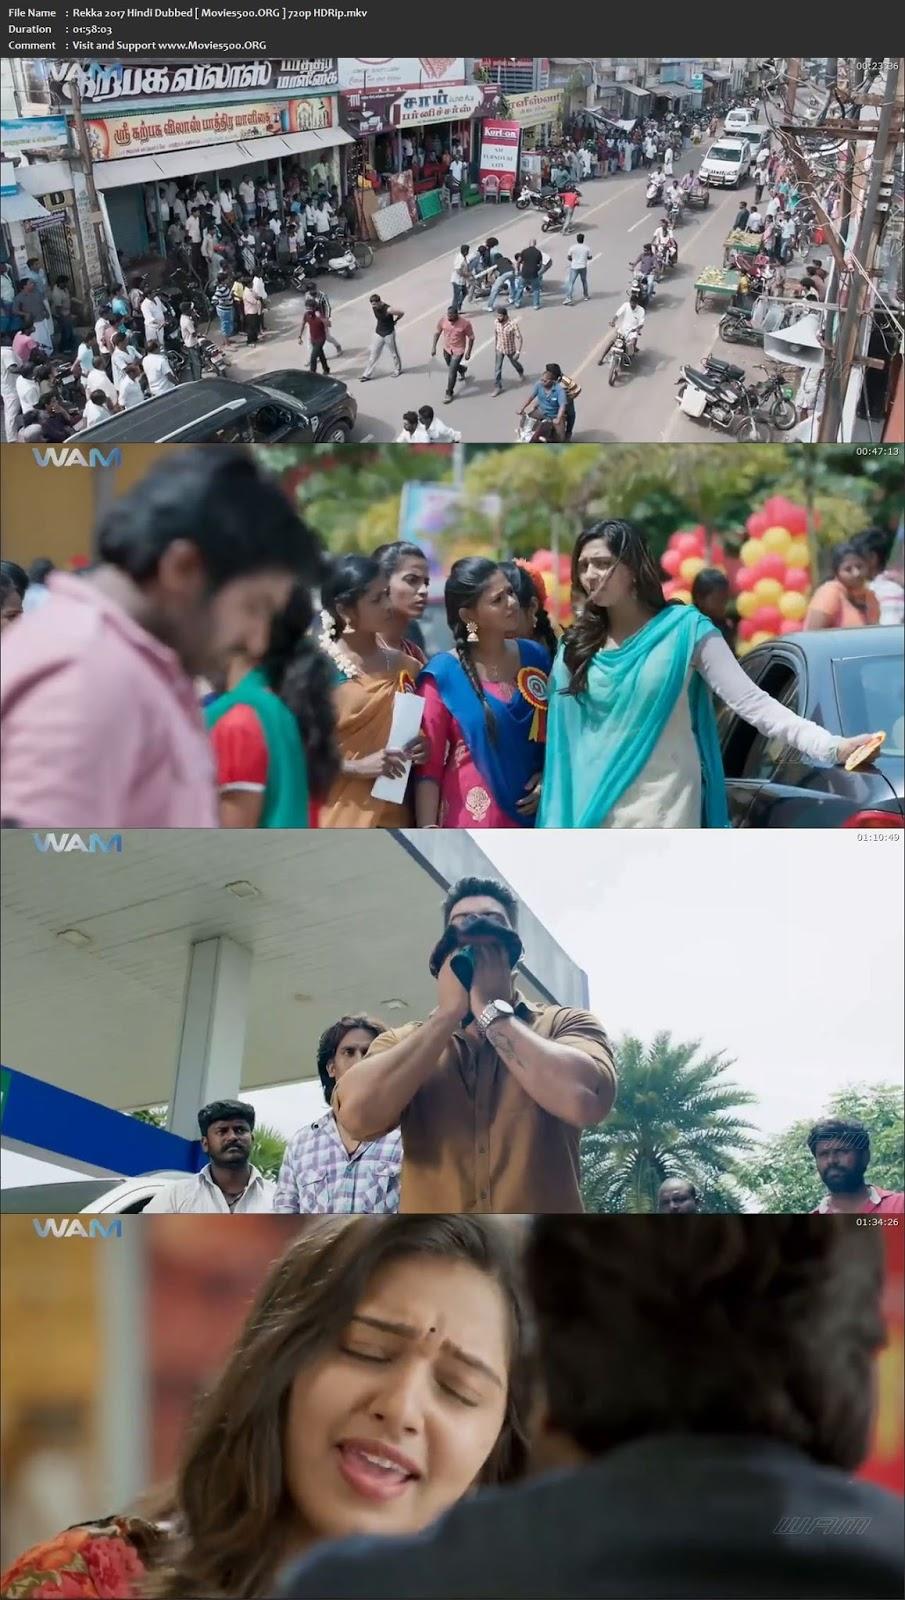 Rekka 2017 Hindi Dubbed Full Movie HDRip 720p at movies500.info